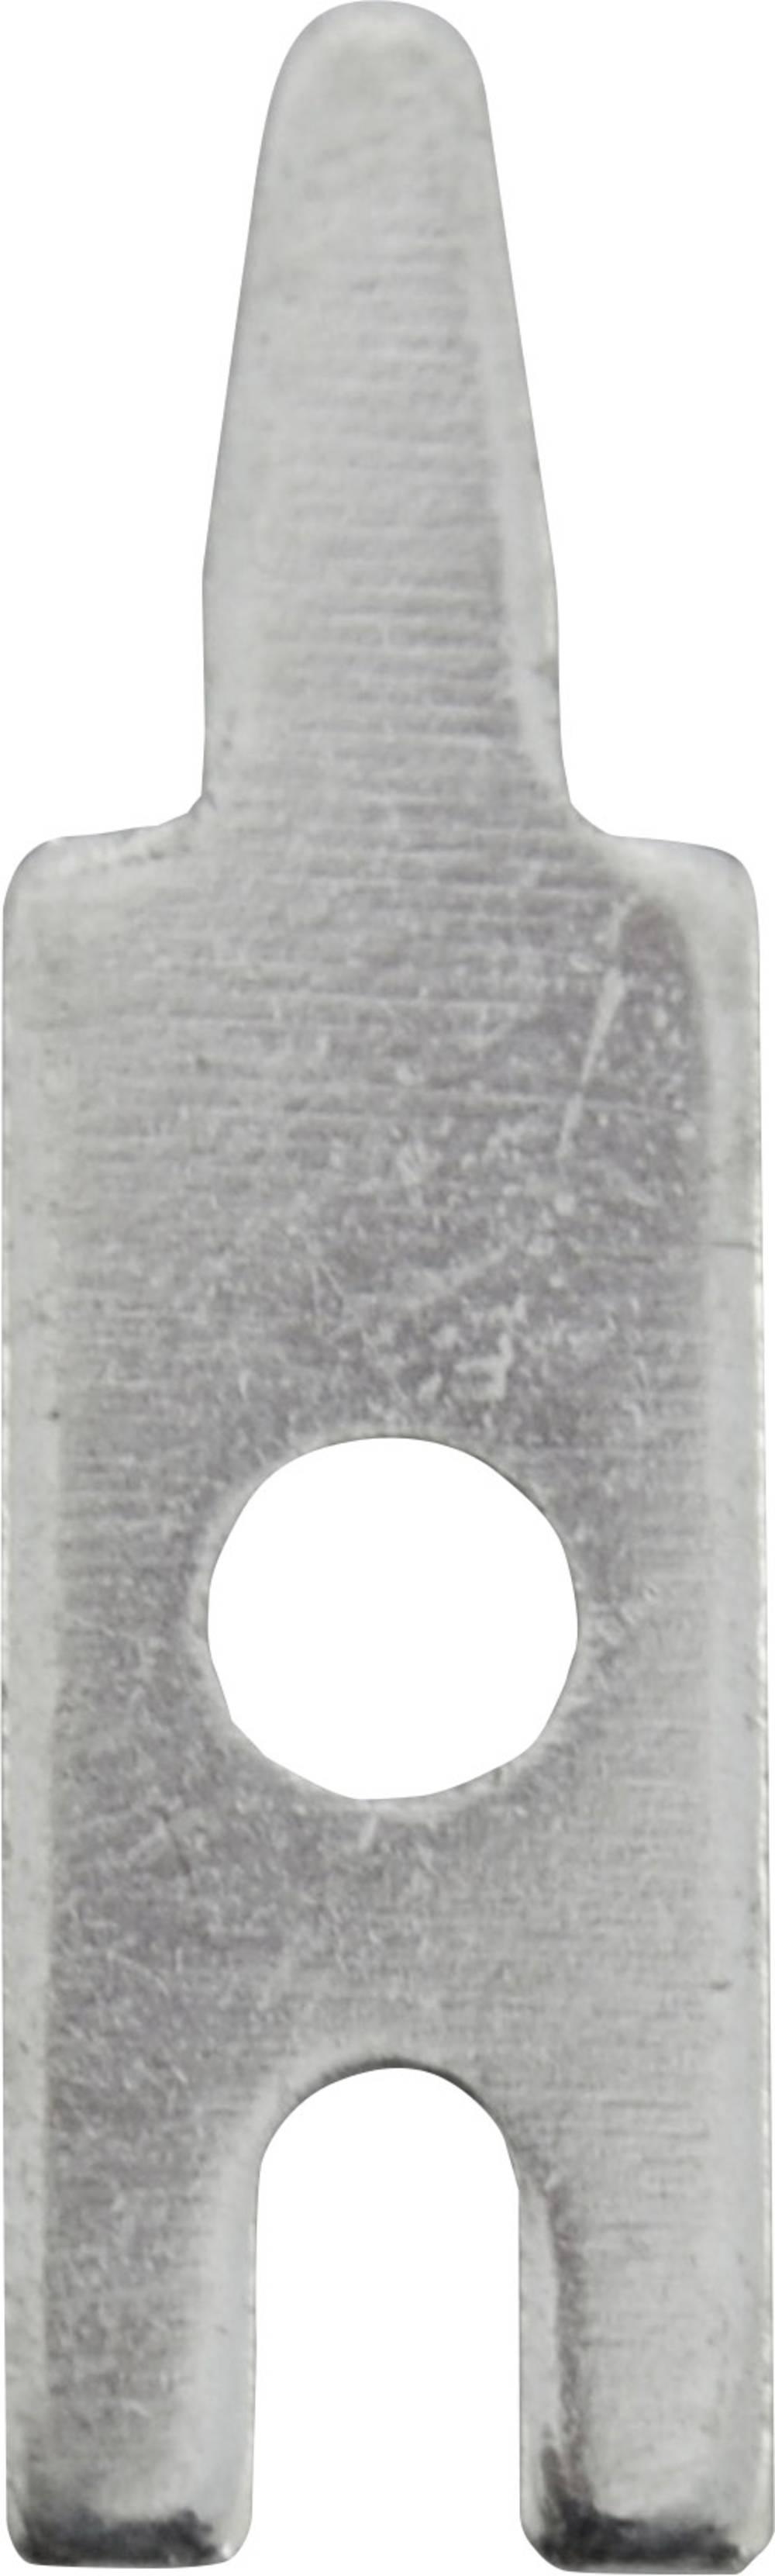 Pins til trykte kredsløb Vogt Verbindungstechnik 1017.68 Kontaktoverflade fortinnet 100 stk